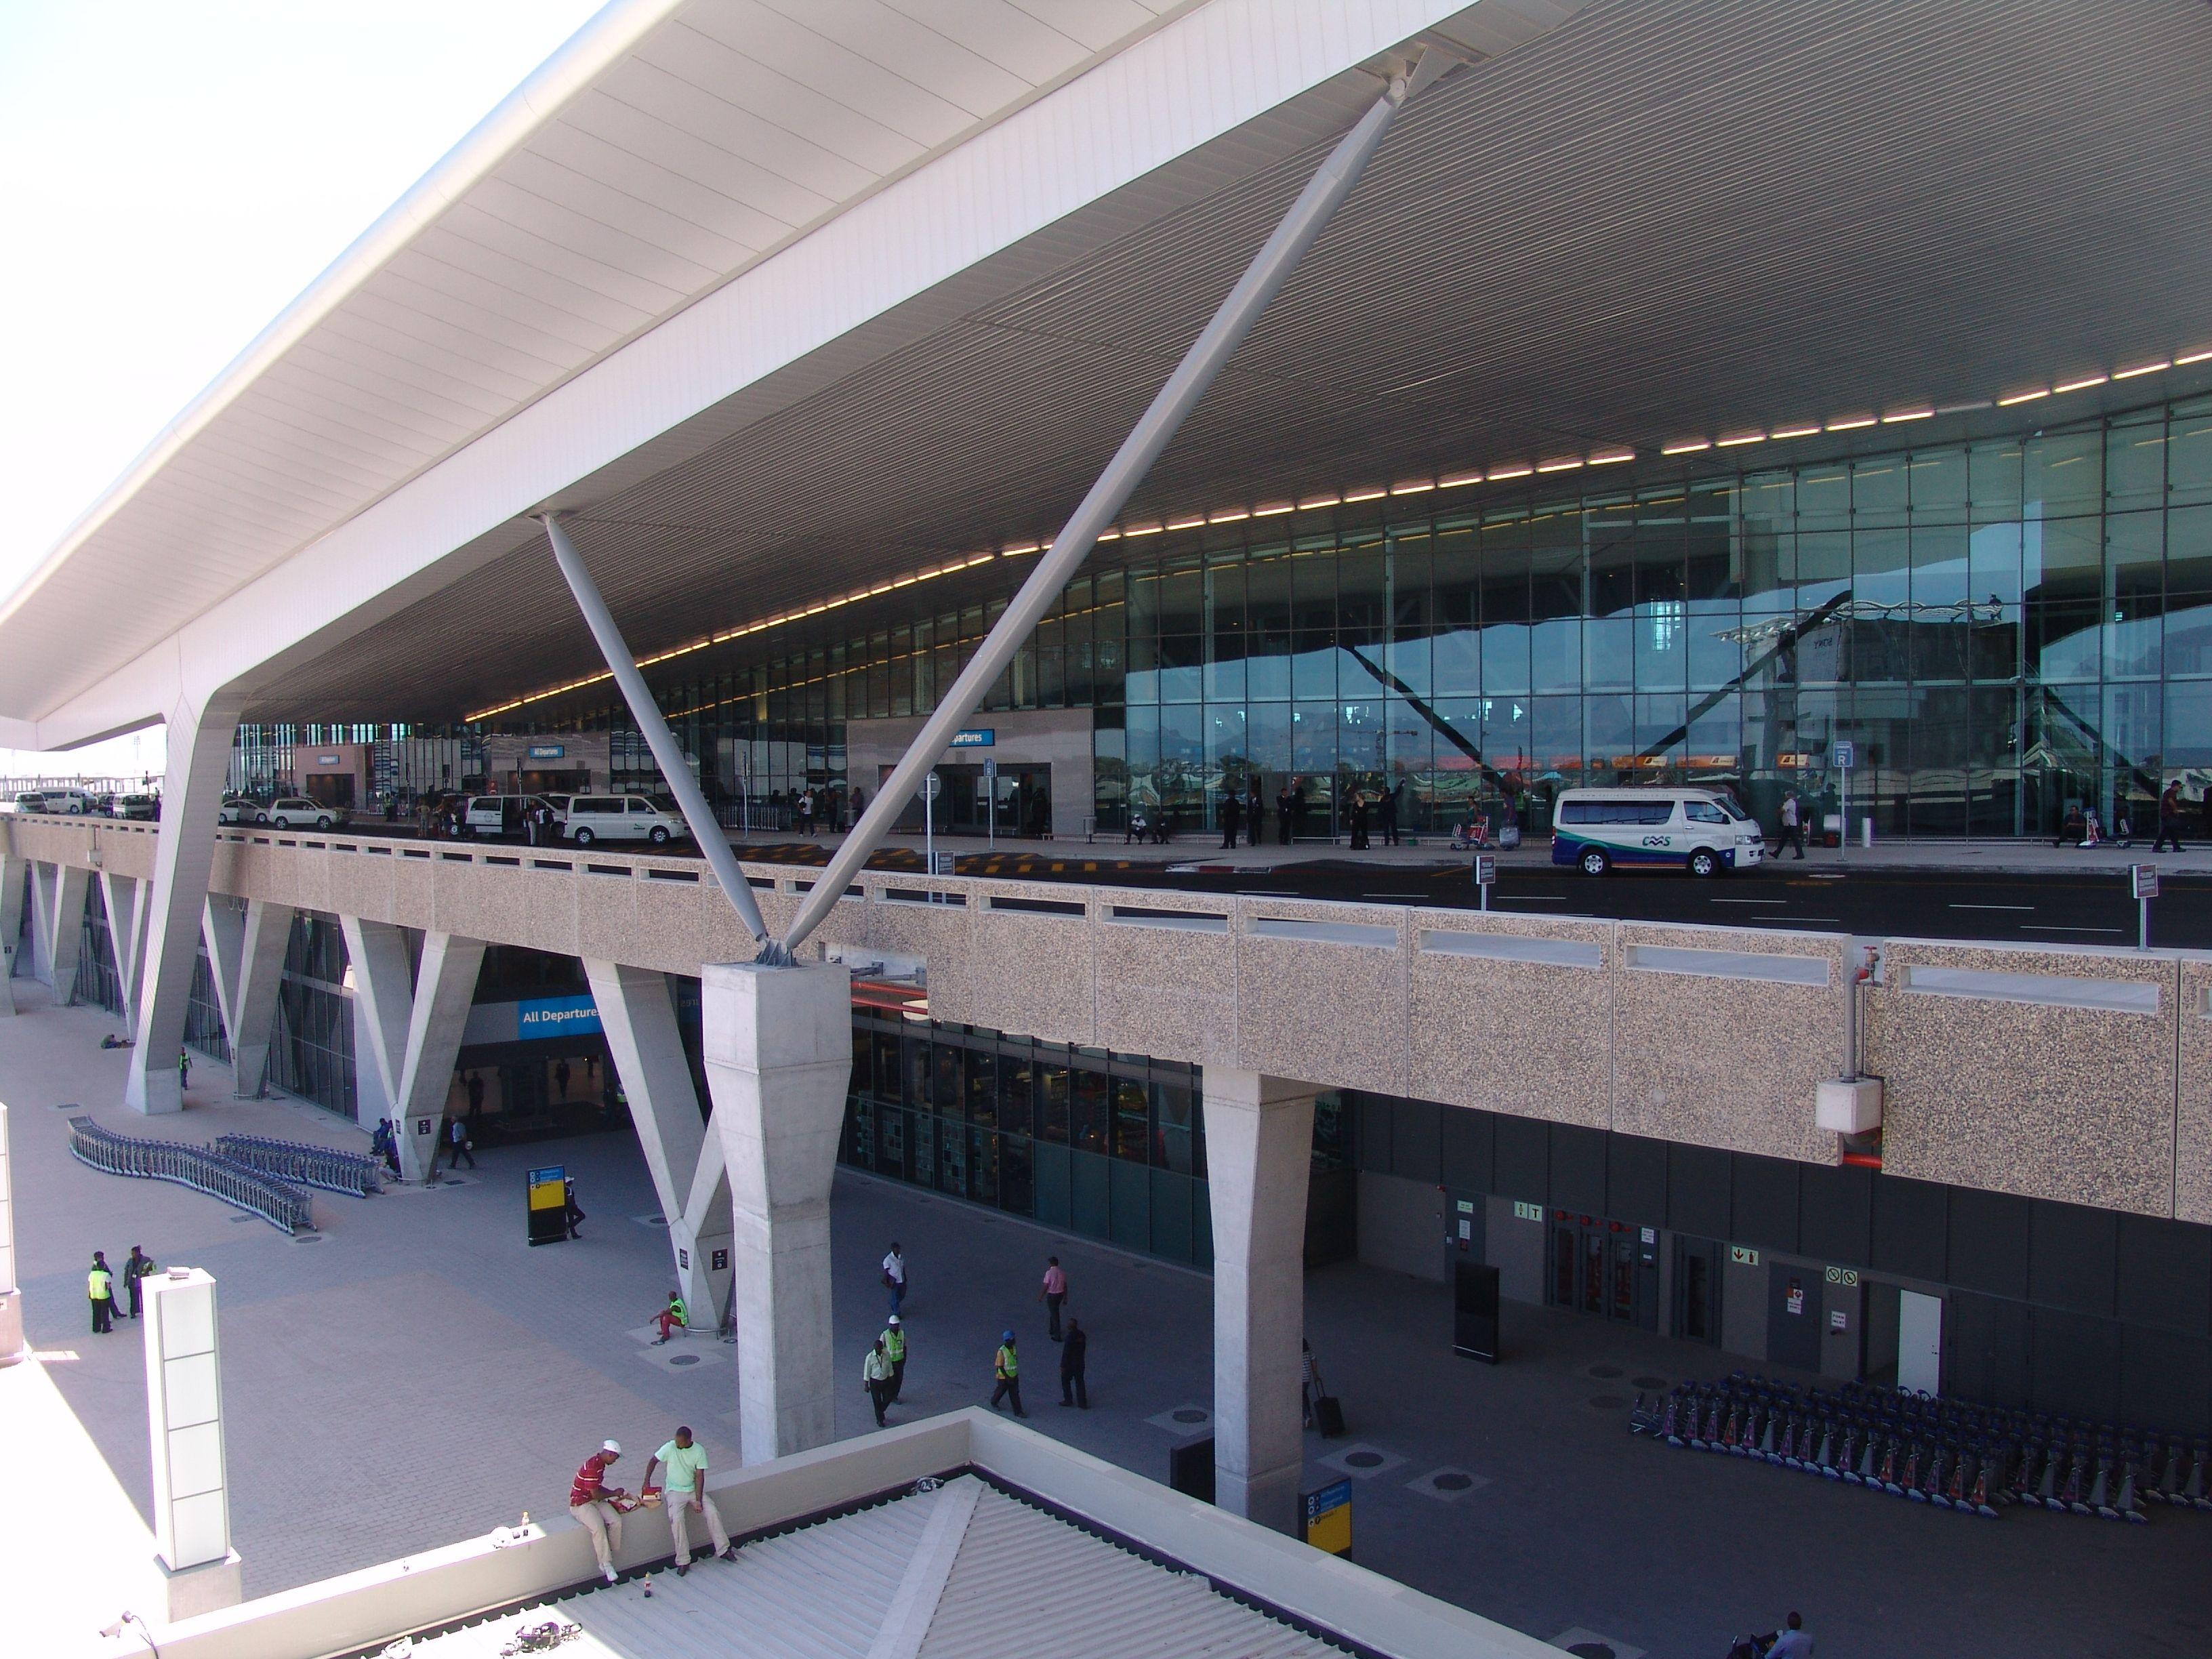 Cheap Car Rentals At Cape Town Airport Cape Town Towns Airport